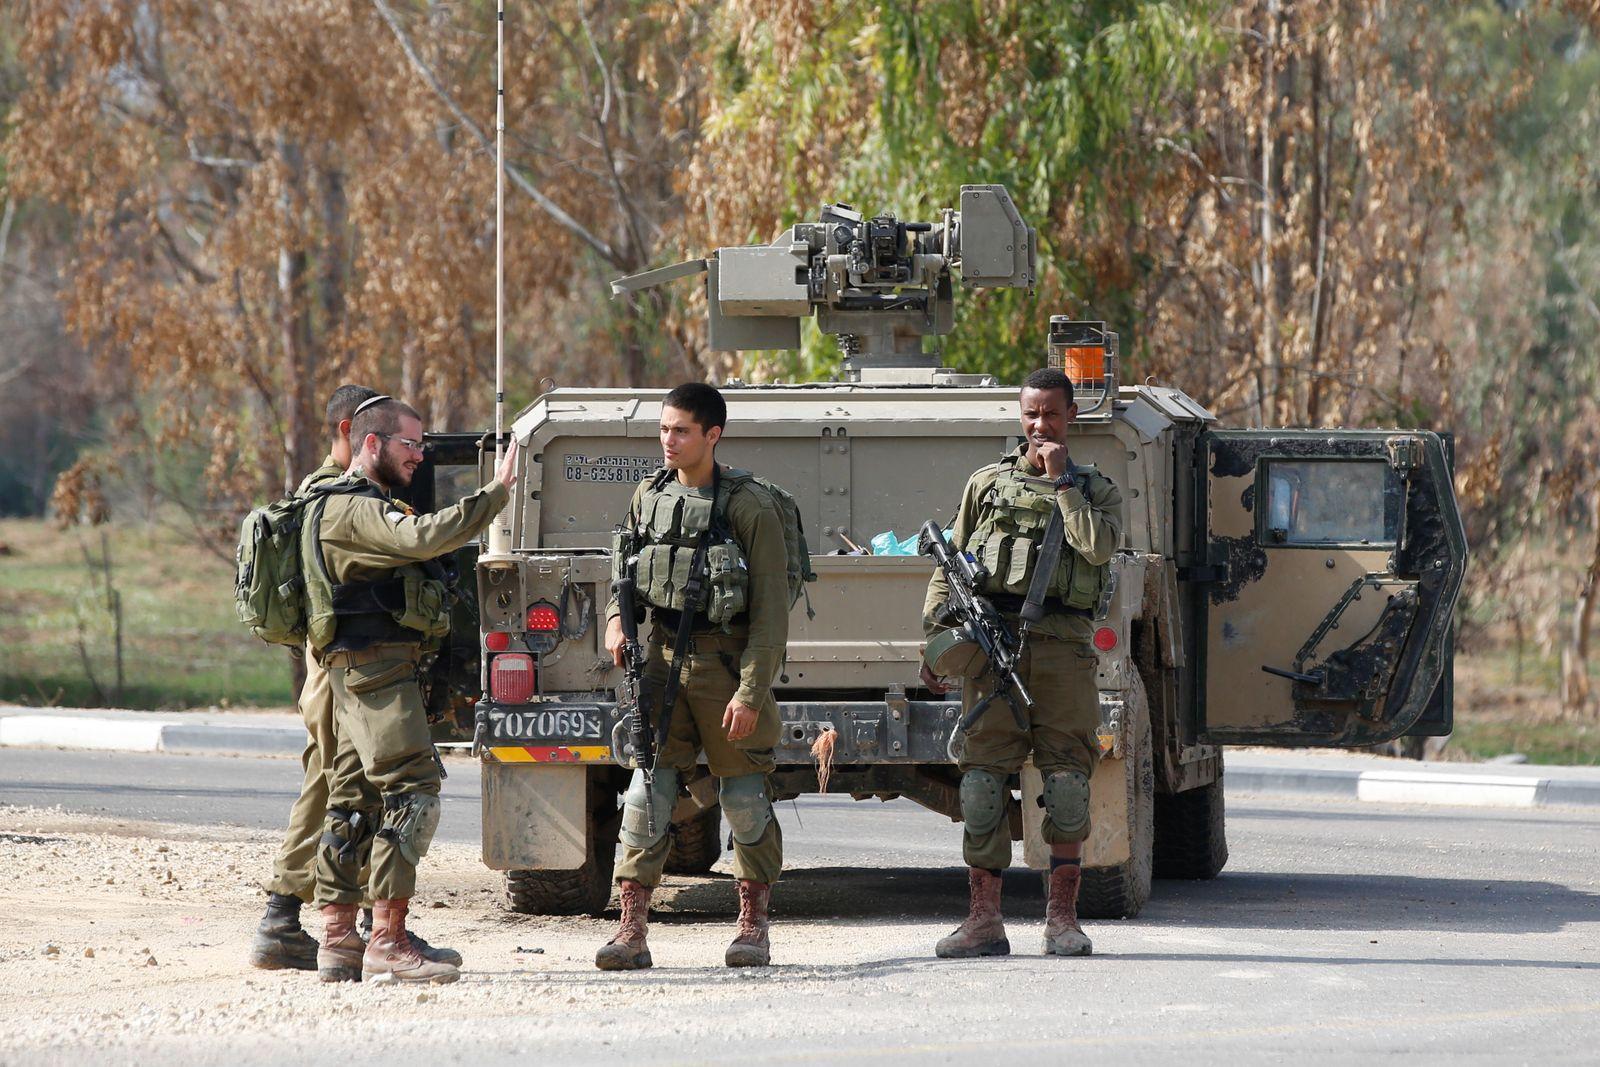 Israel boosts security measures in Gaza amid rising tensions, Gaza Border - 12 Nov 2018